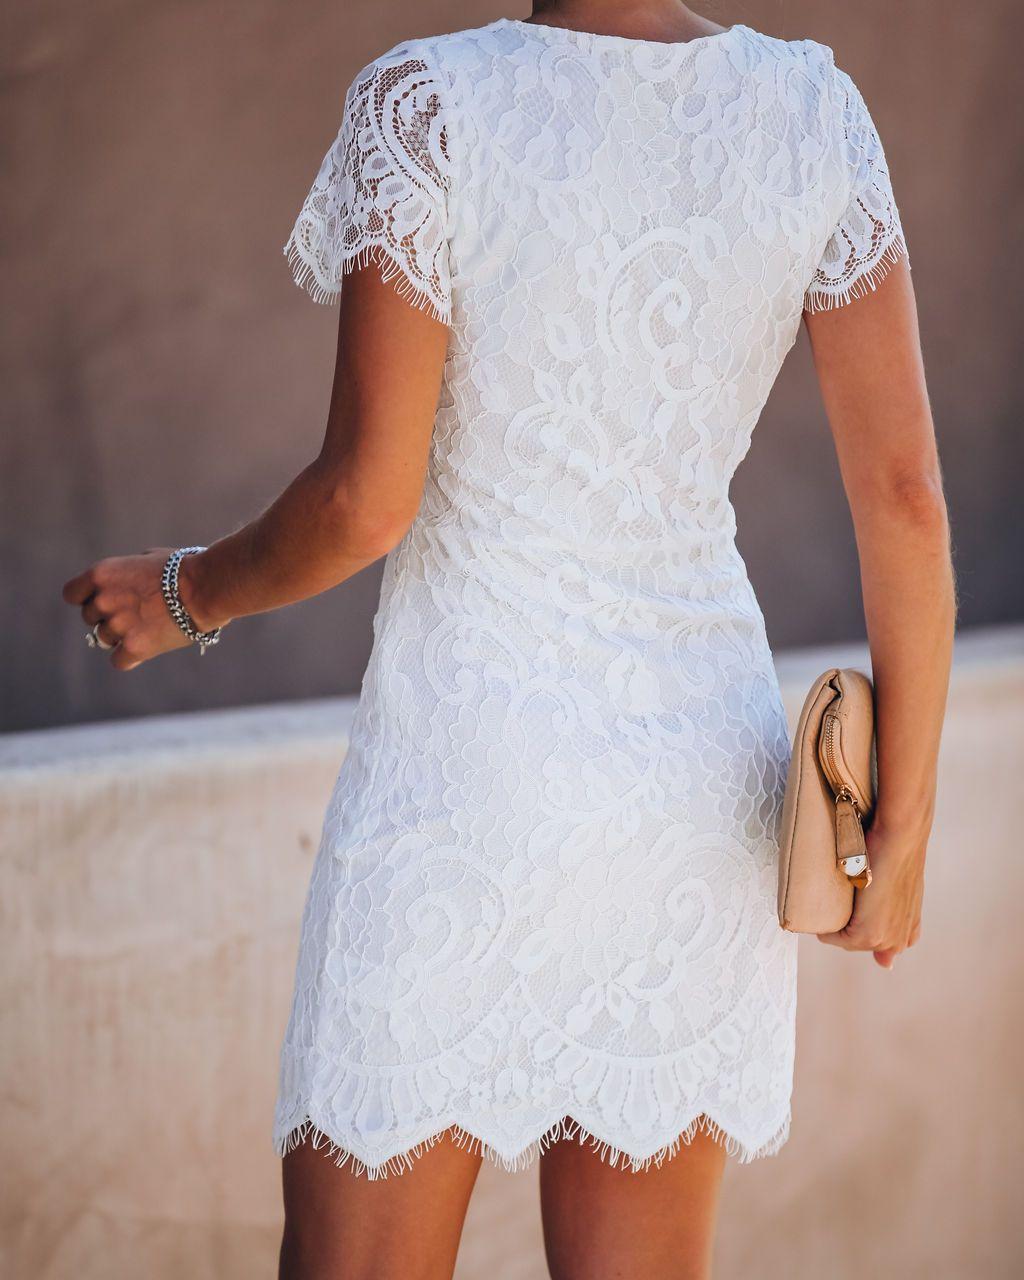 Beyond Words Lace Dress White Final Sale Lace White Dress White Bridal Shower Dress Engagement Party Dresses [ 1280 x 1024 Pixel ]